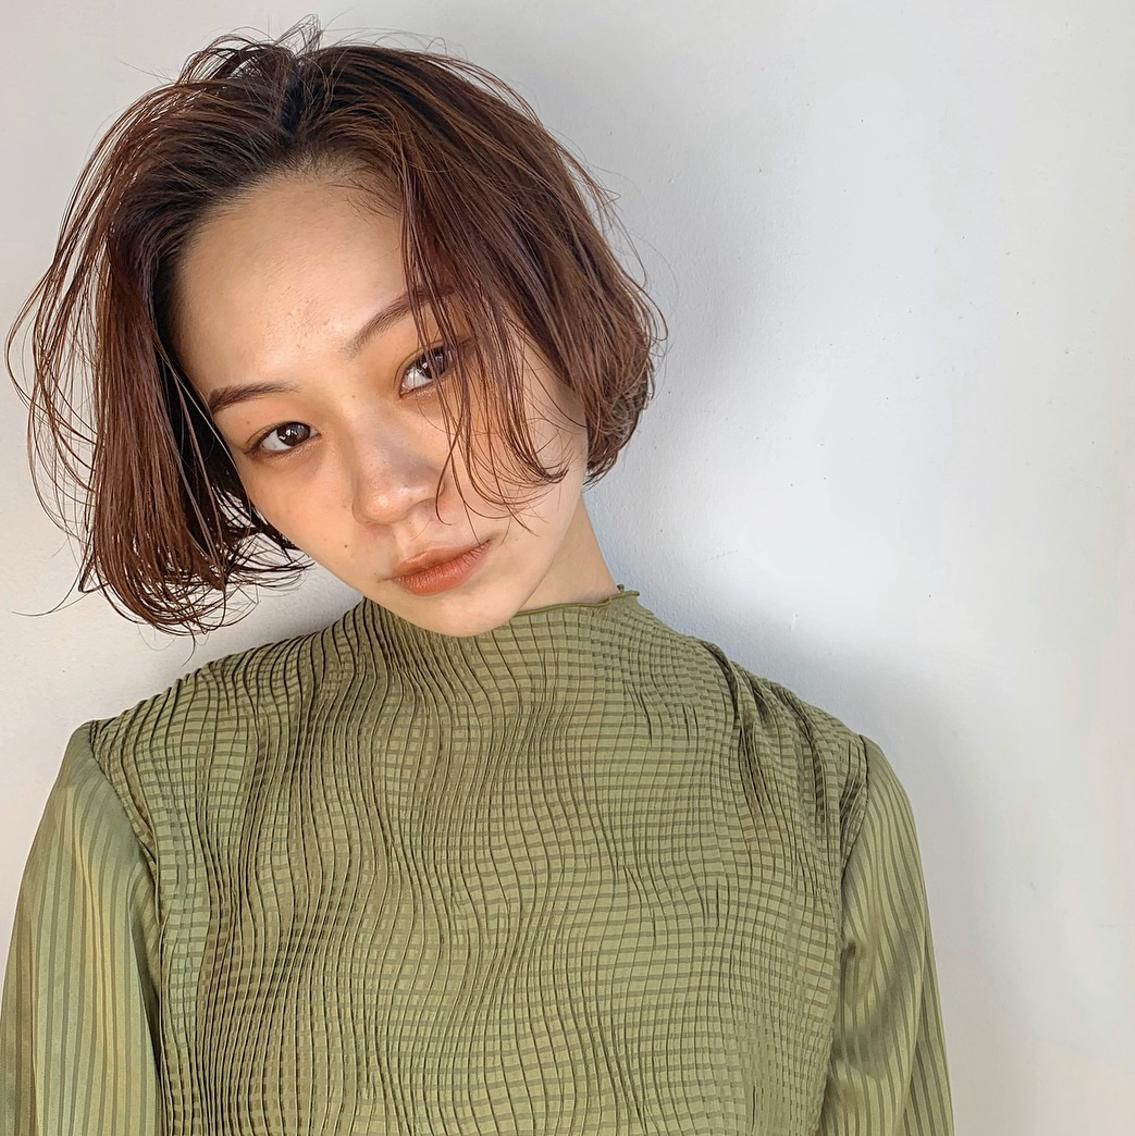 magico所属・小林 玲奈カラーリストの掲載